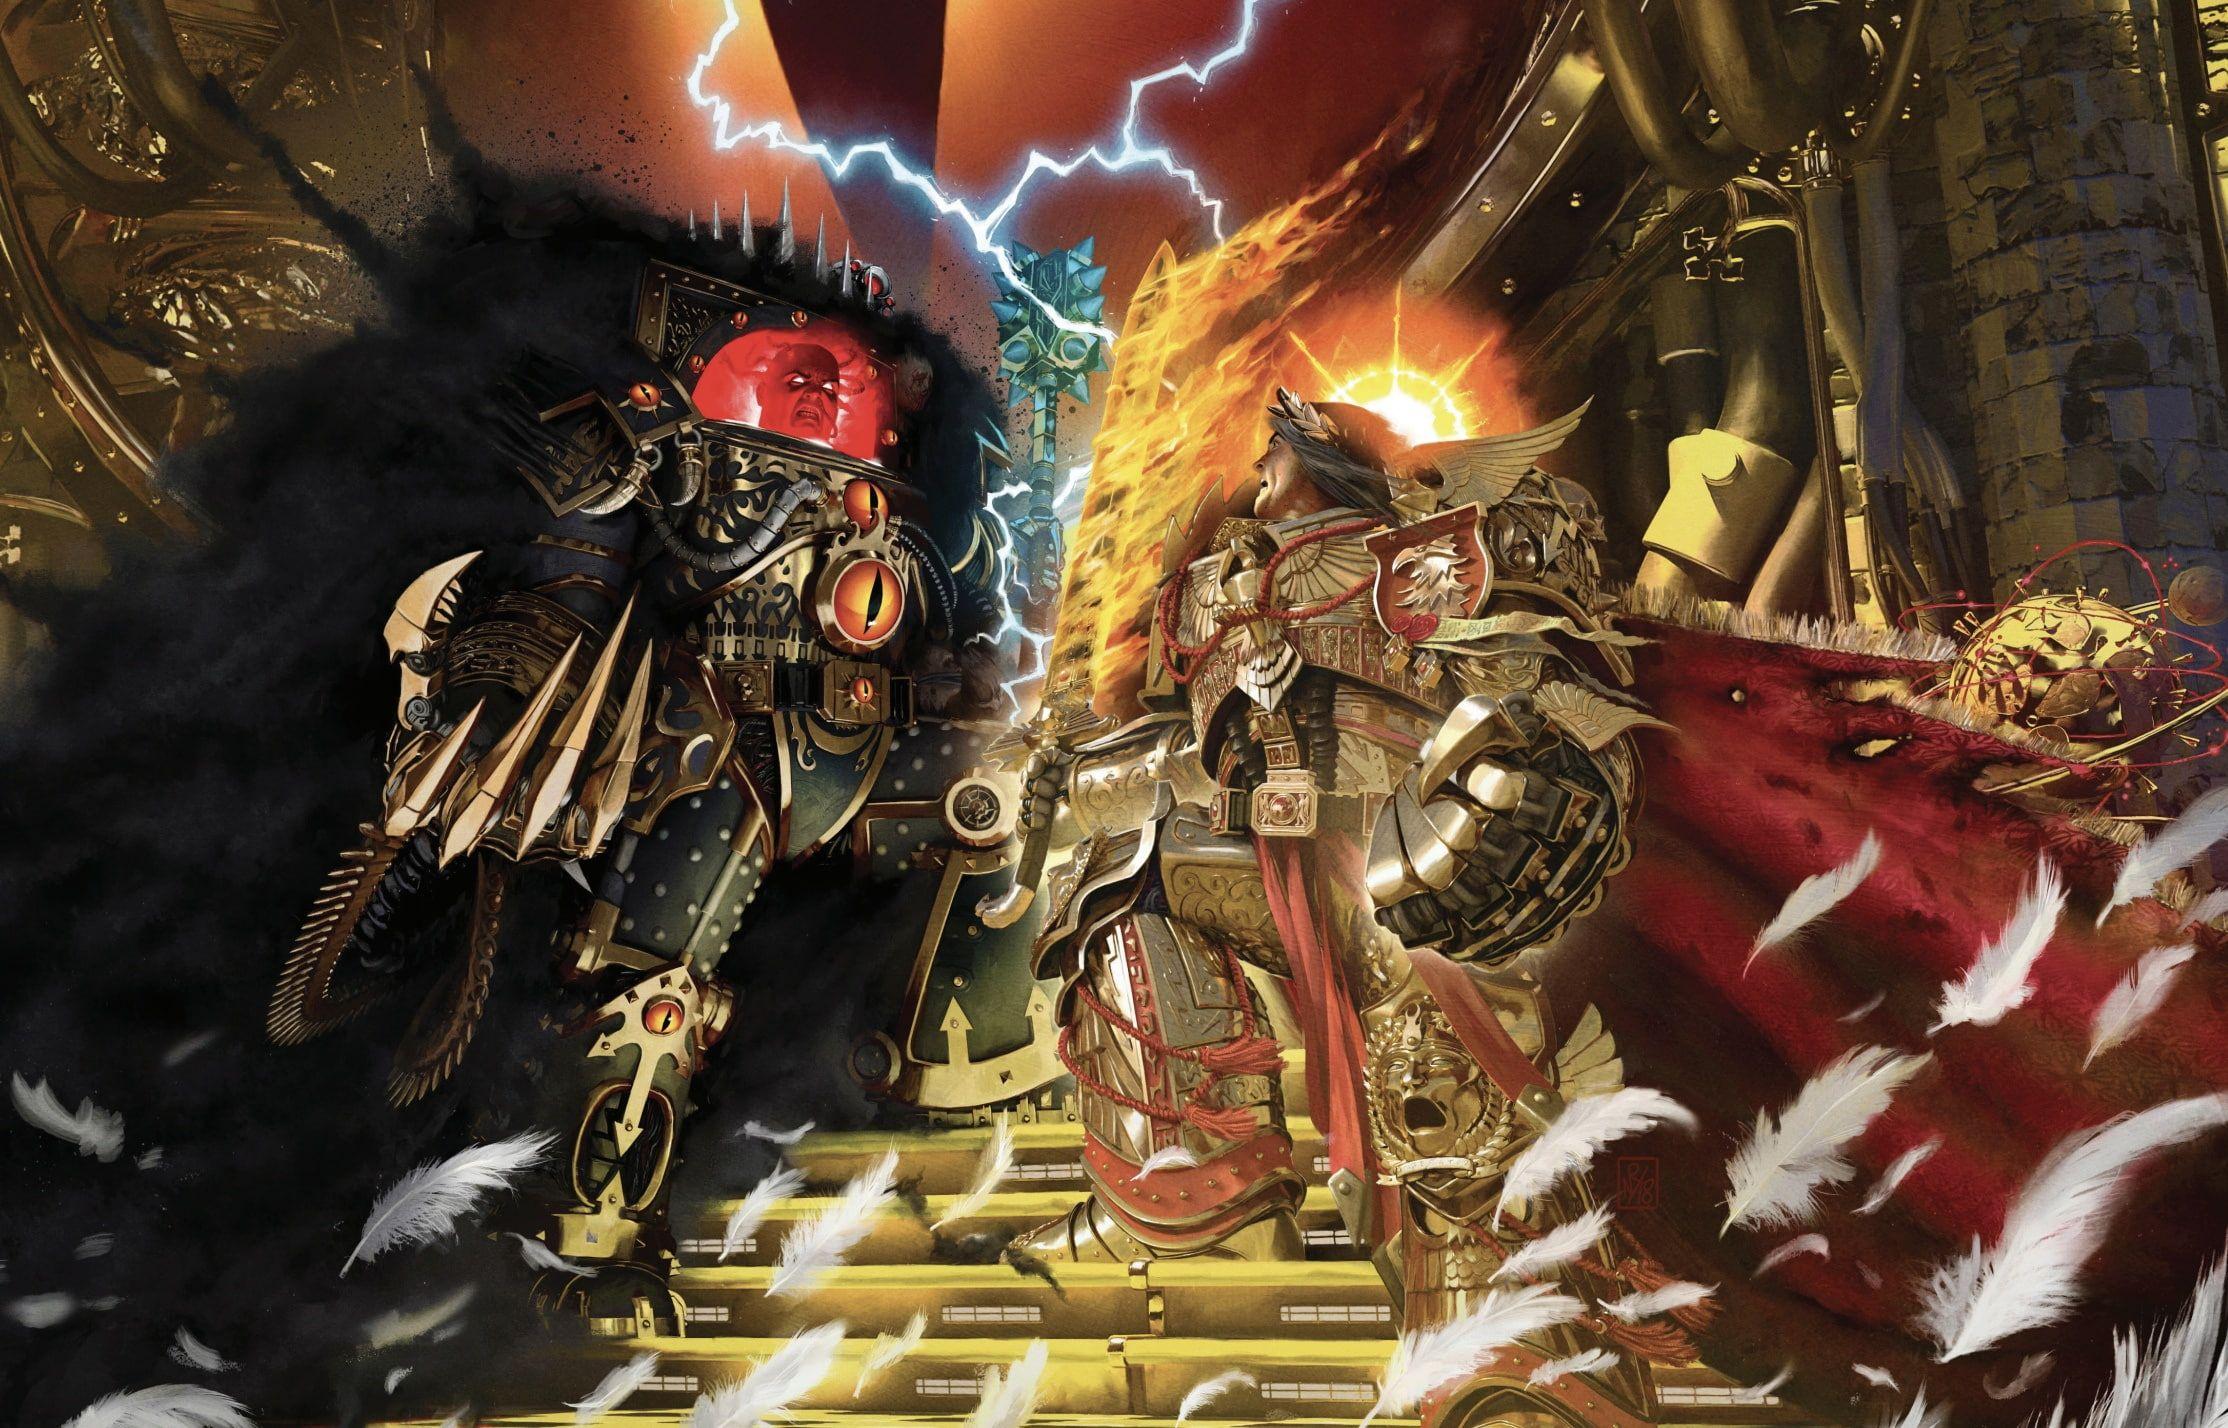 Horus Heresy Battle Warhammer 40 000 Emperor Of Mankind Horus Artbook Traitor Primarch 1080p Wallpaper In 2020 Warhammer The Horus Heresy Warhammer 40k Artwork